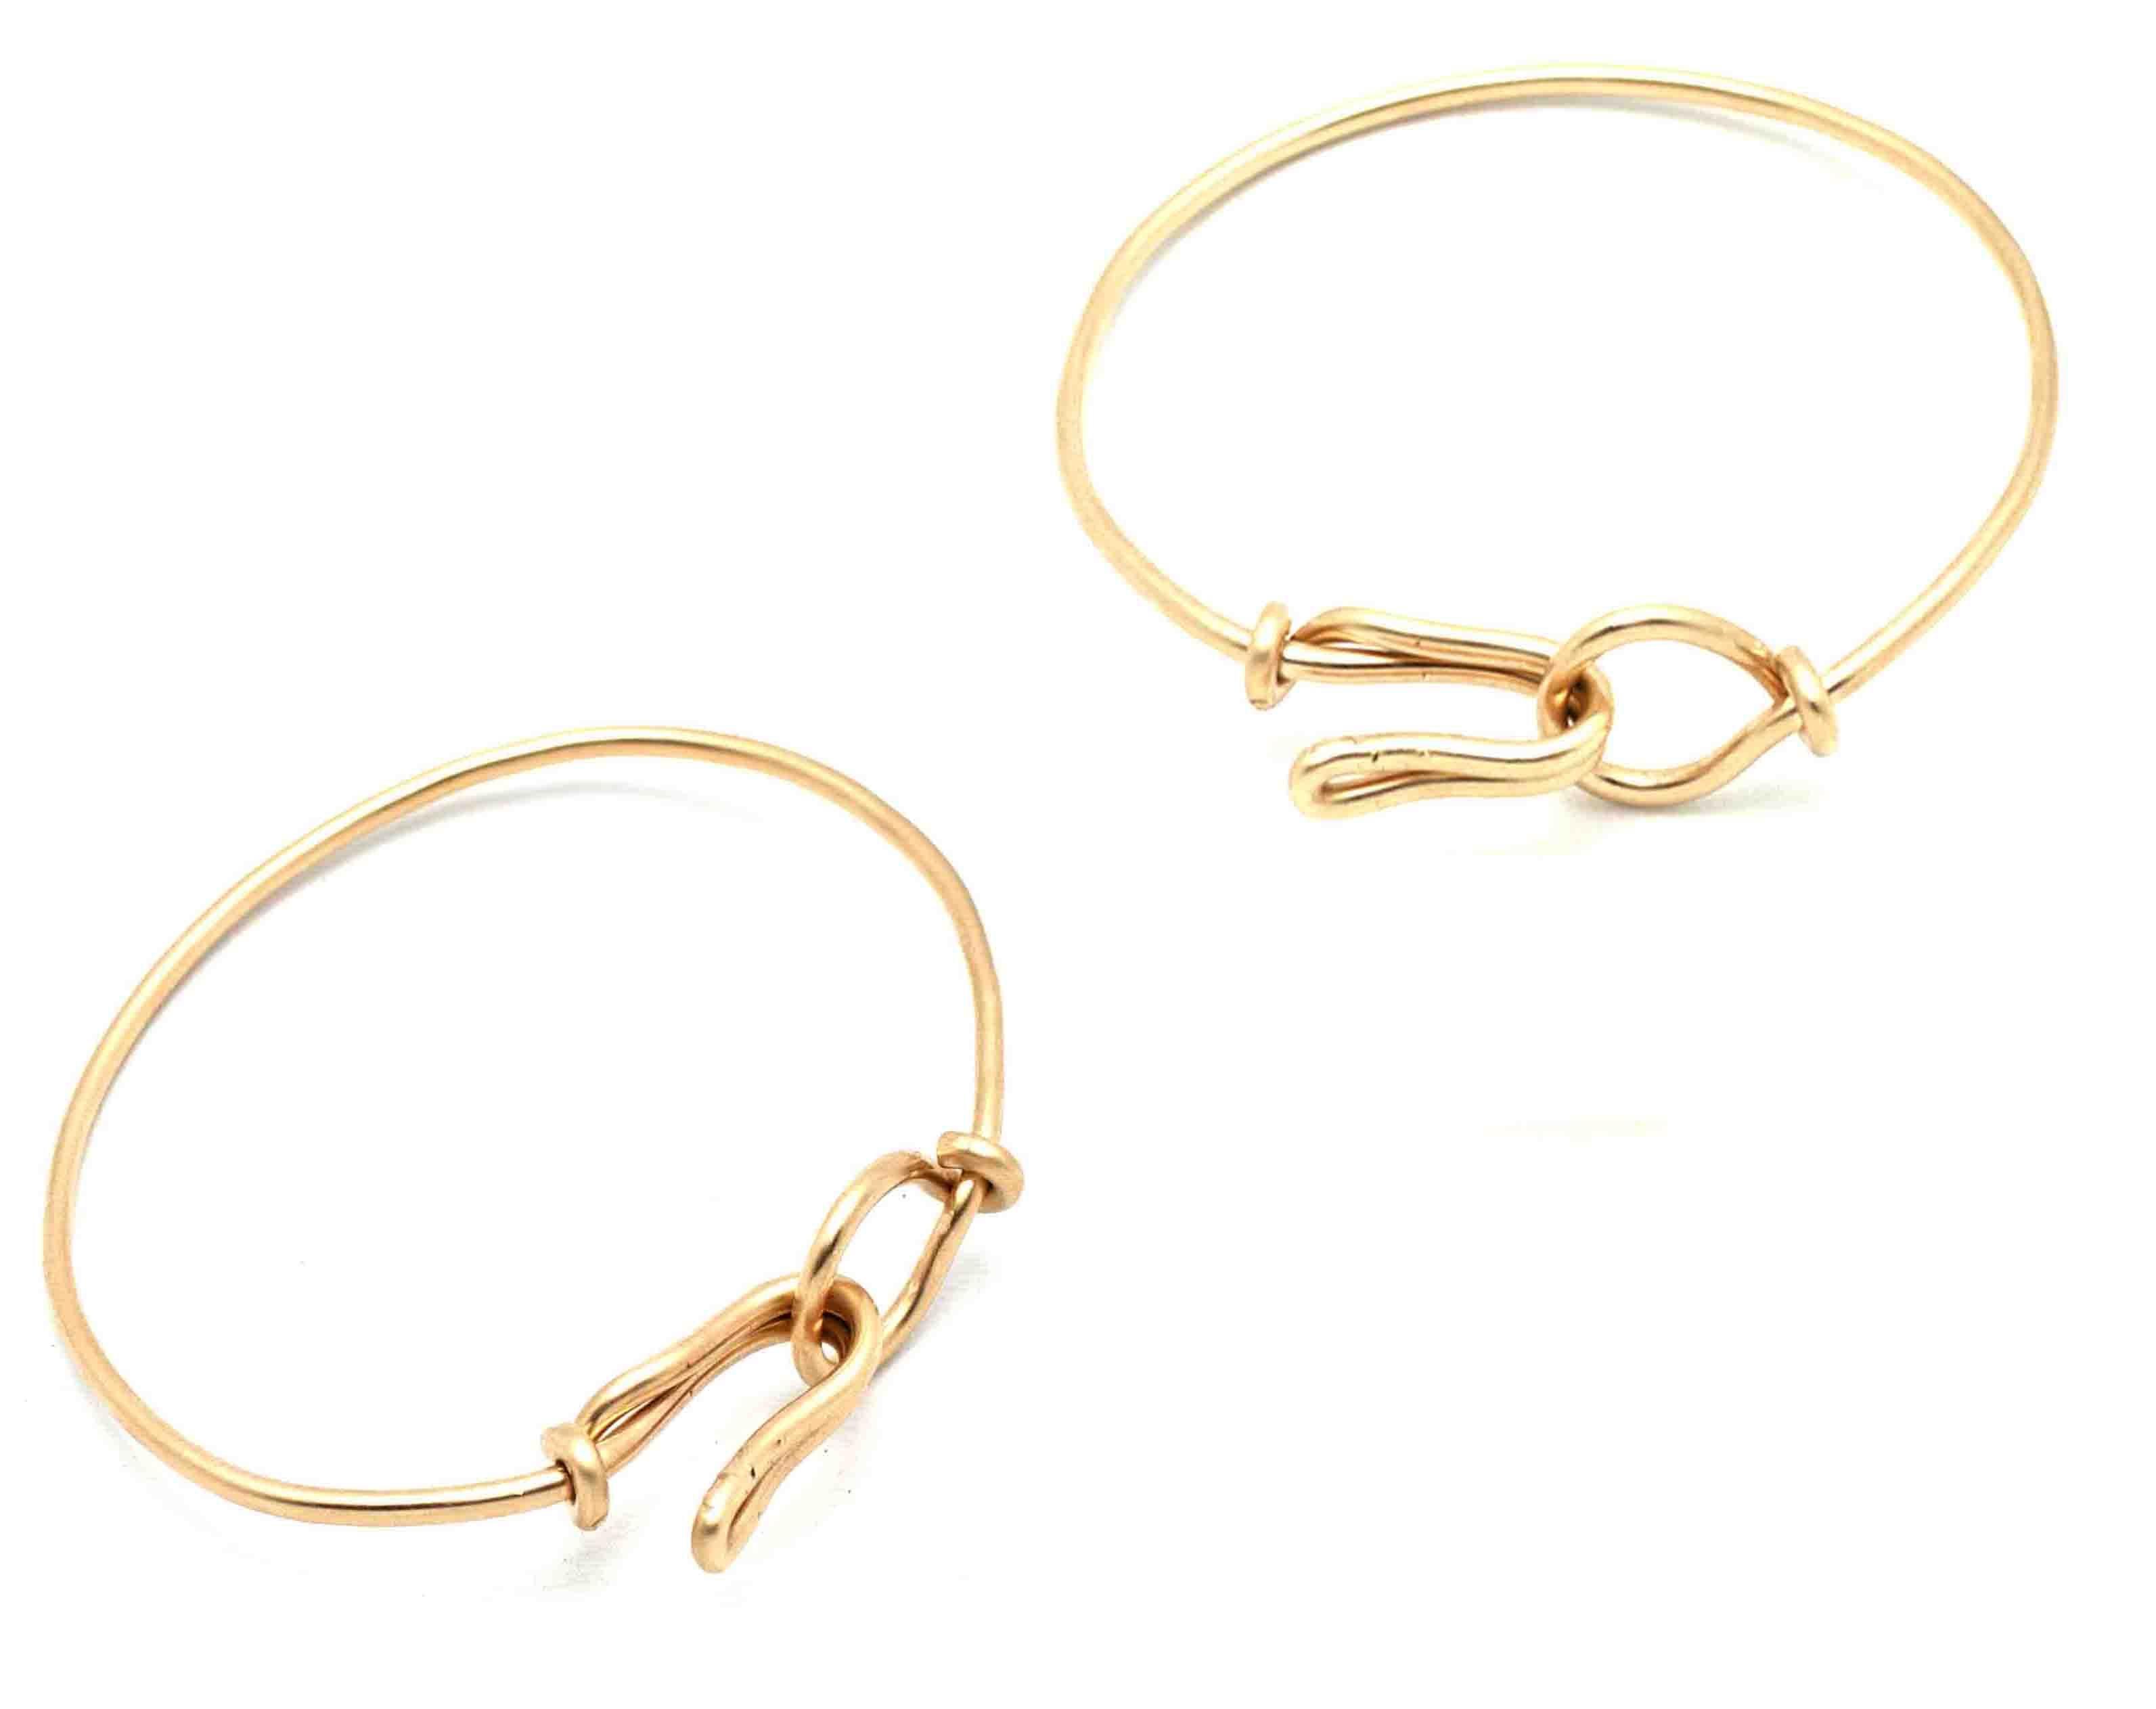 Handmade Gold Filled Wire Wrapped Bracelet. Simple, elegant bangle ...